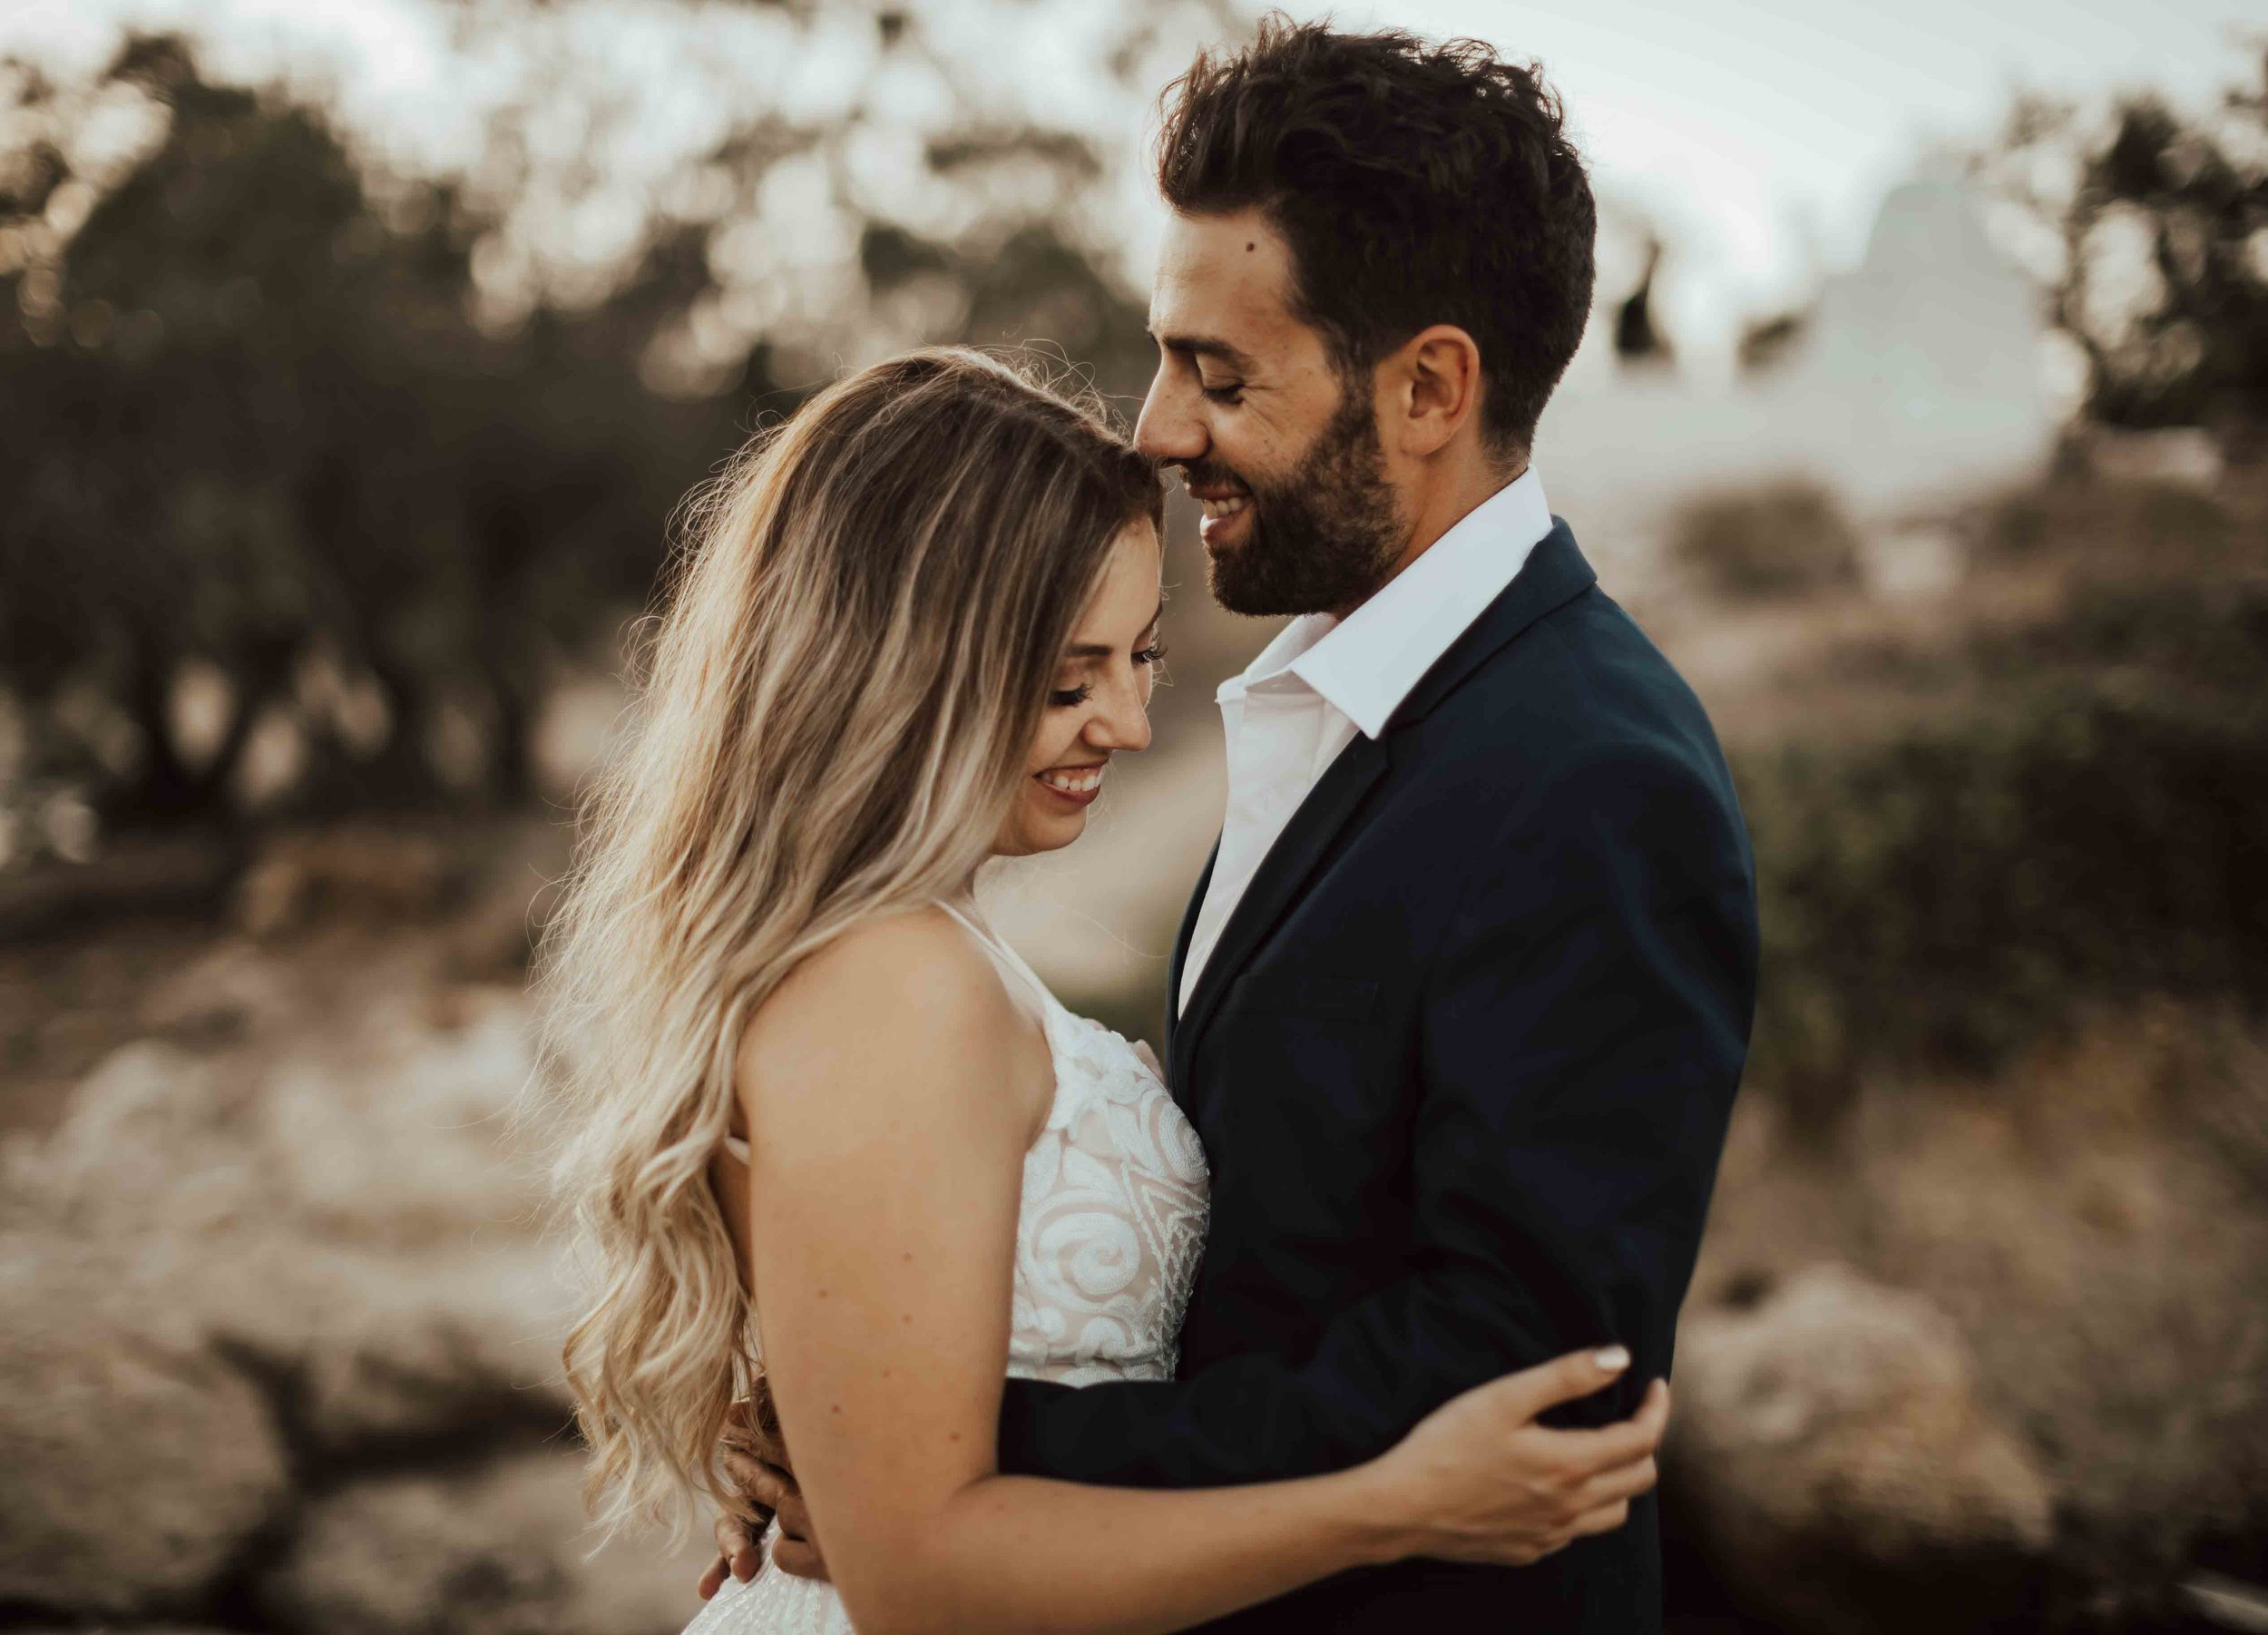 weddingday-44.jpg